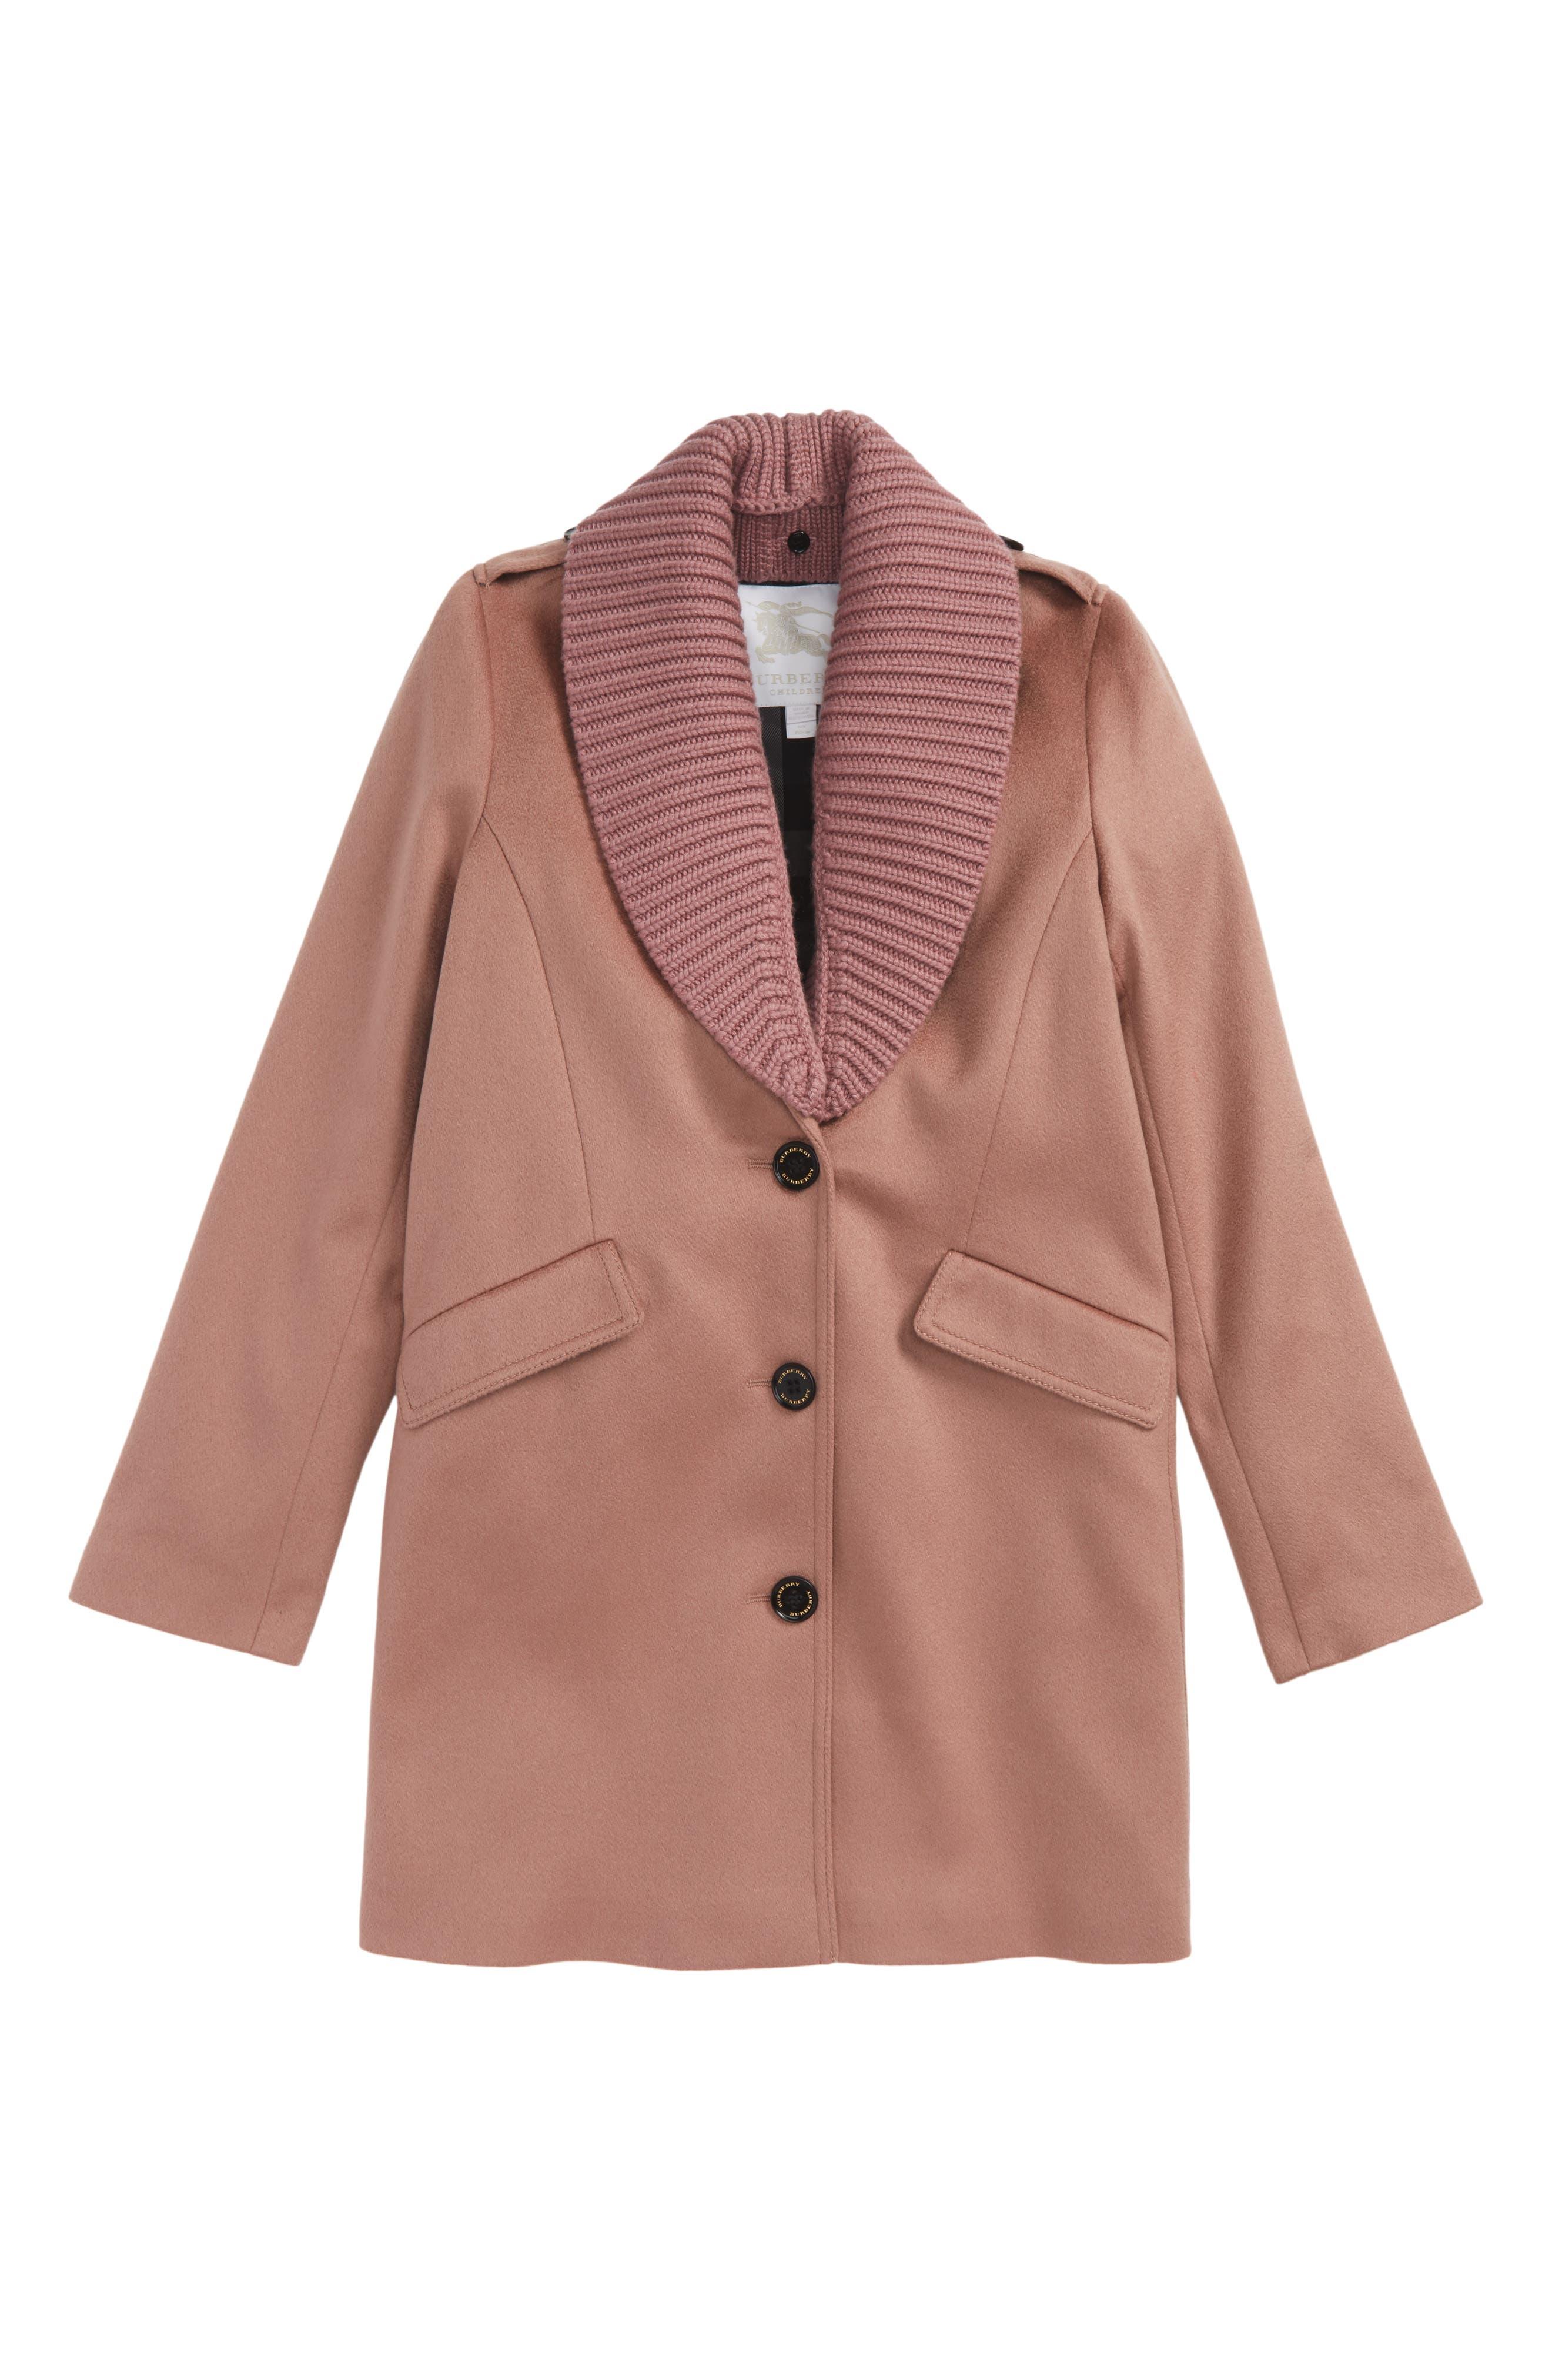 Main Image - Burberry Bridget Shawl Collar Cashmere Coat (Little Girls & Big Girls)